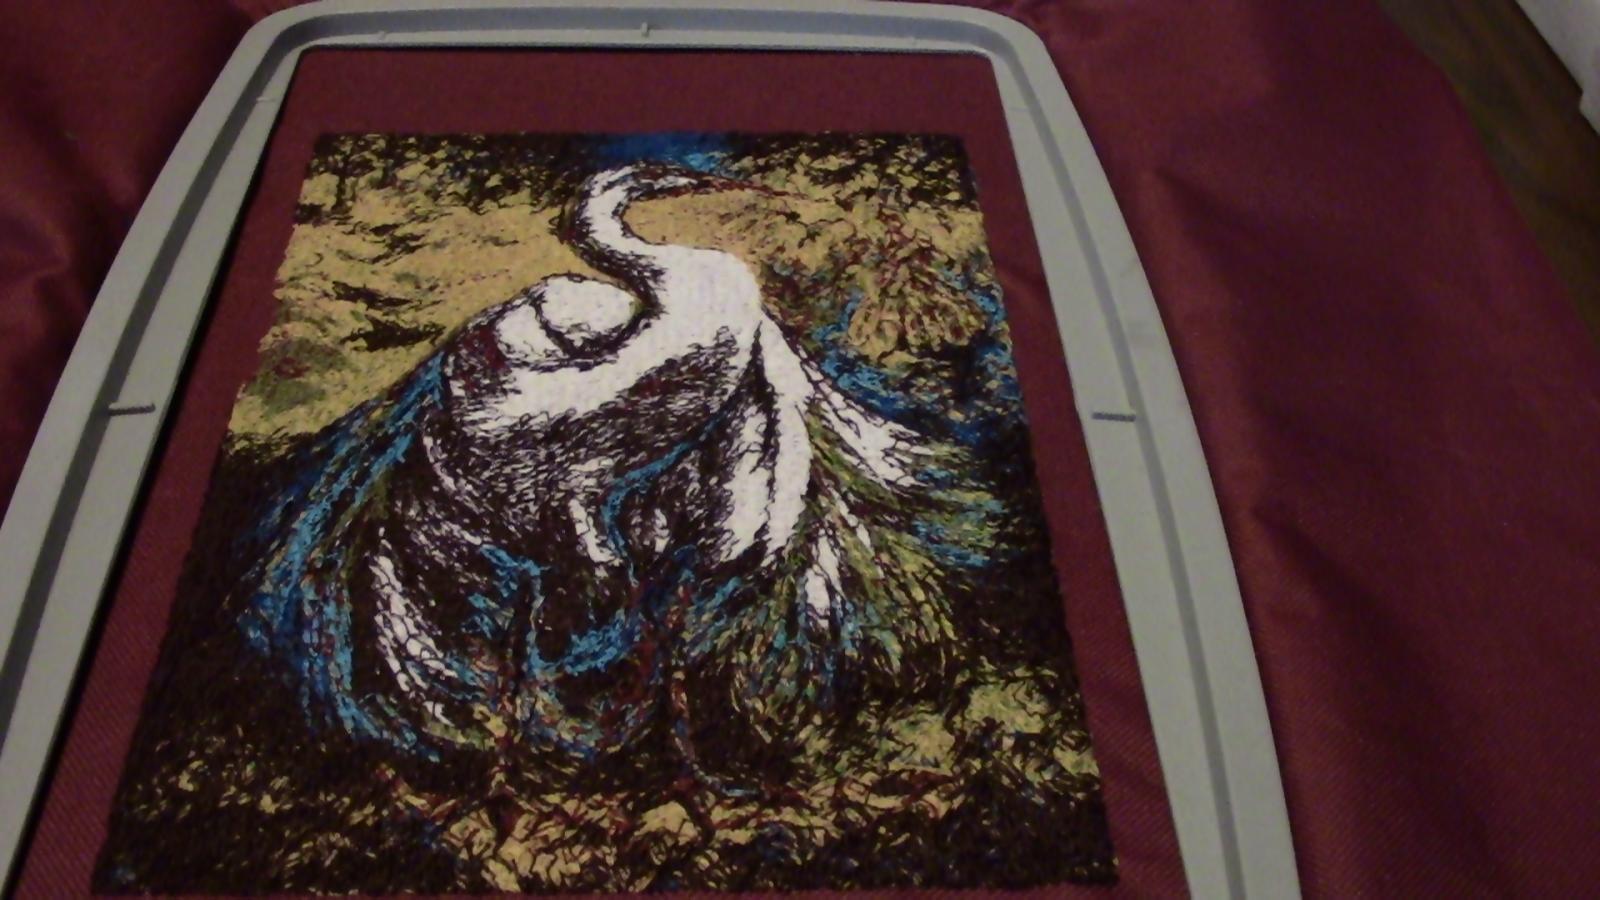 White stork embroidery design